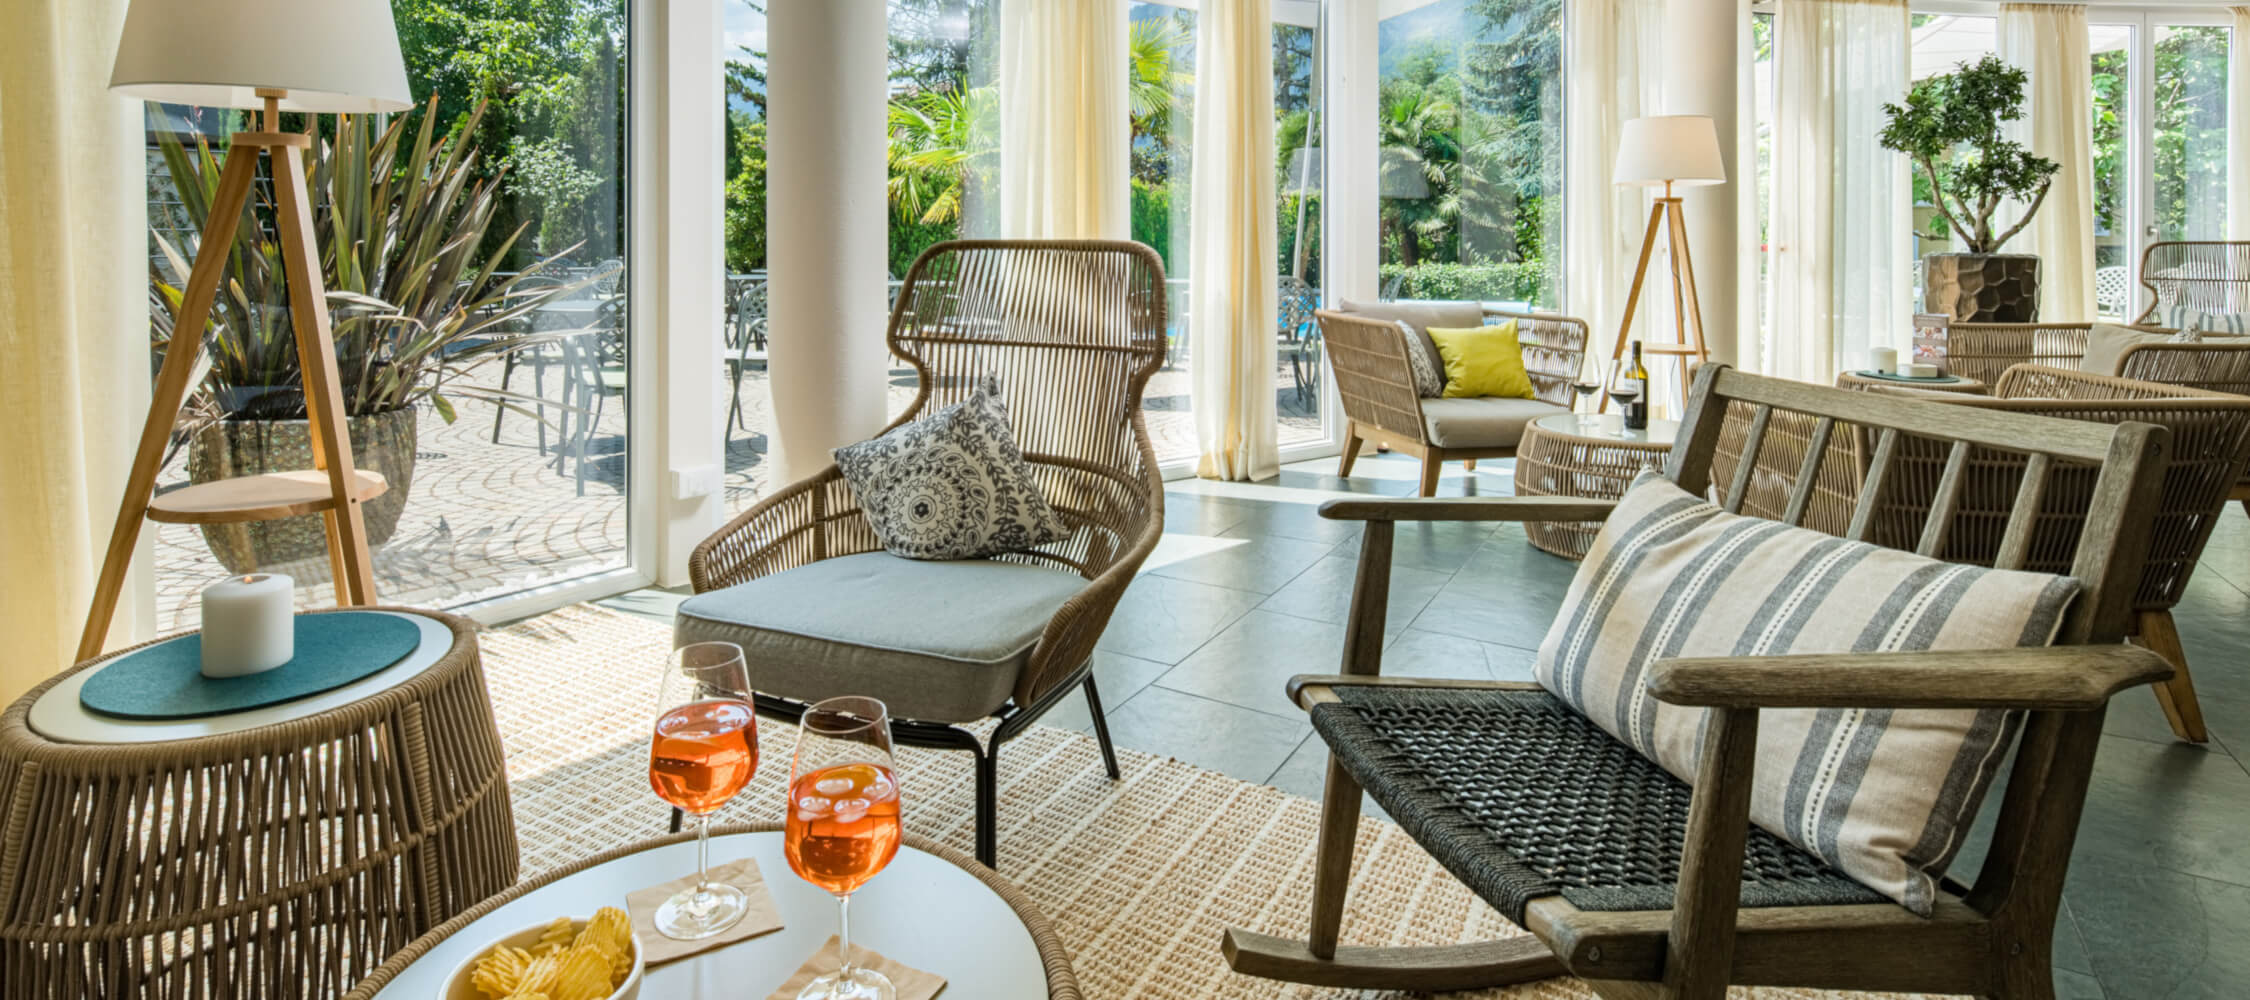 Hotel-Villa-Laurus-Merano-Bar-Lounge-A-FlorianBusch-13-2250x1000